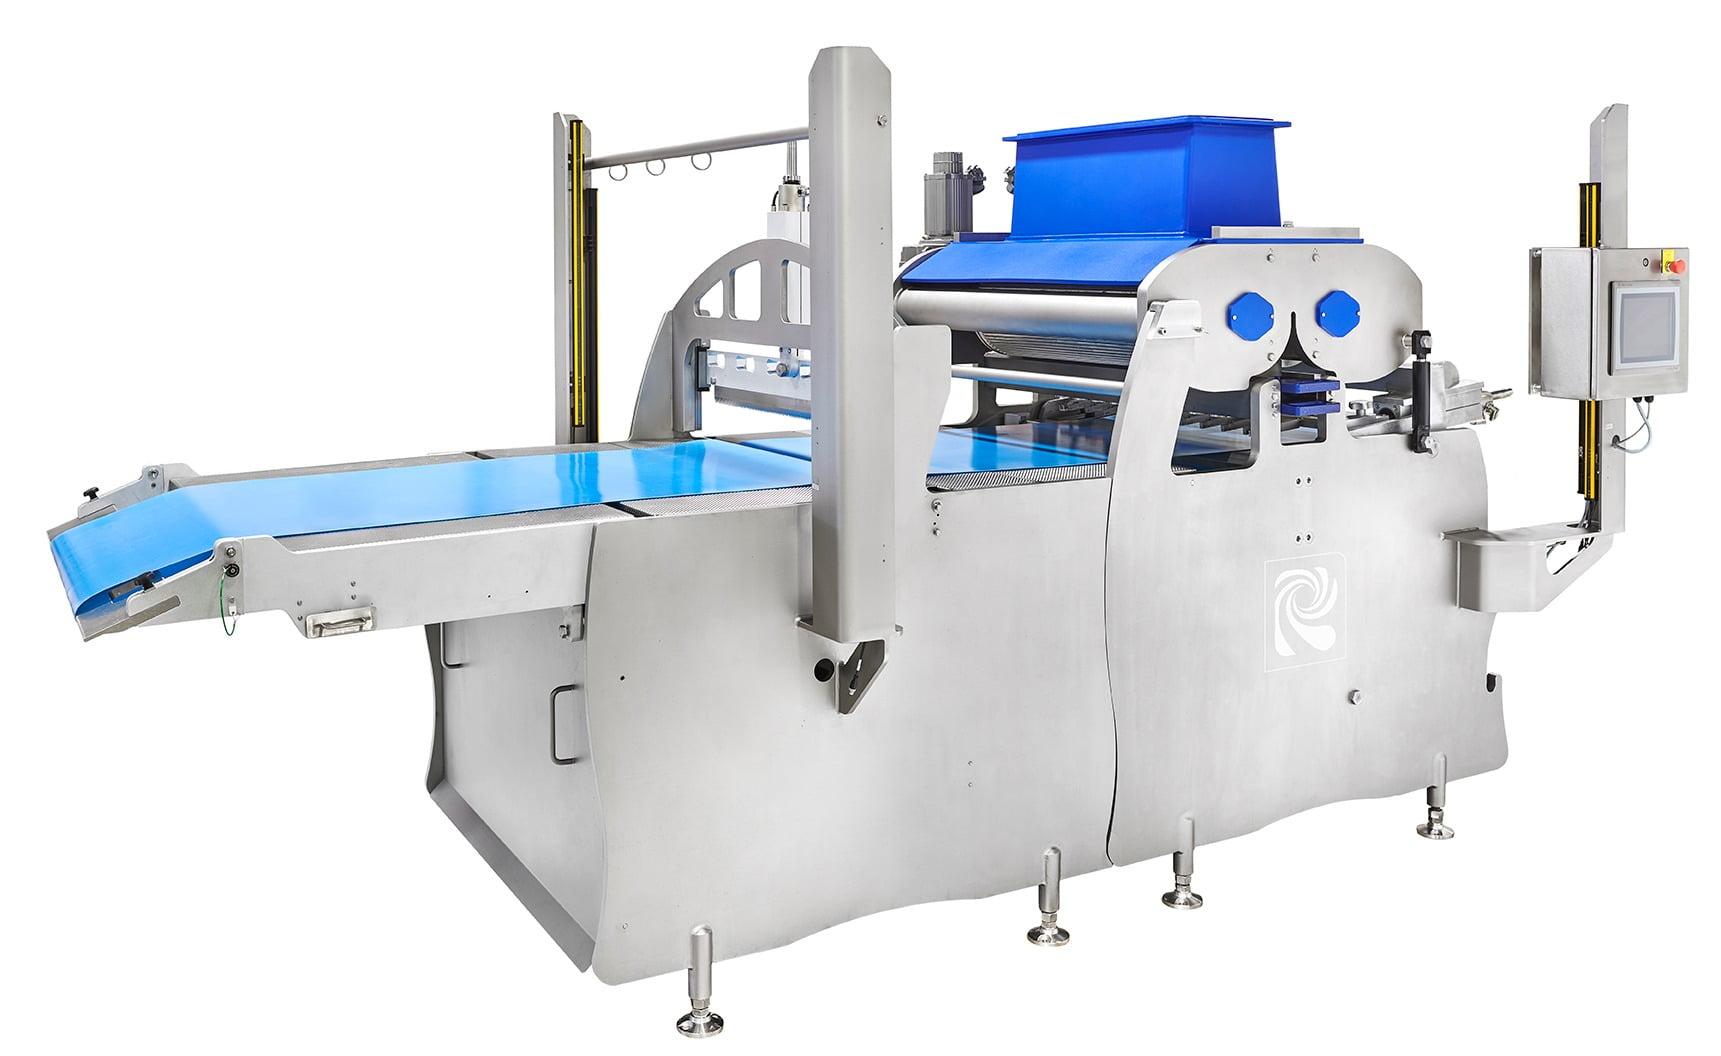 Equipment, Metal, Conveyor, Machine, Line, Blue, Product